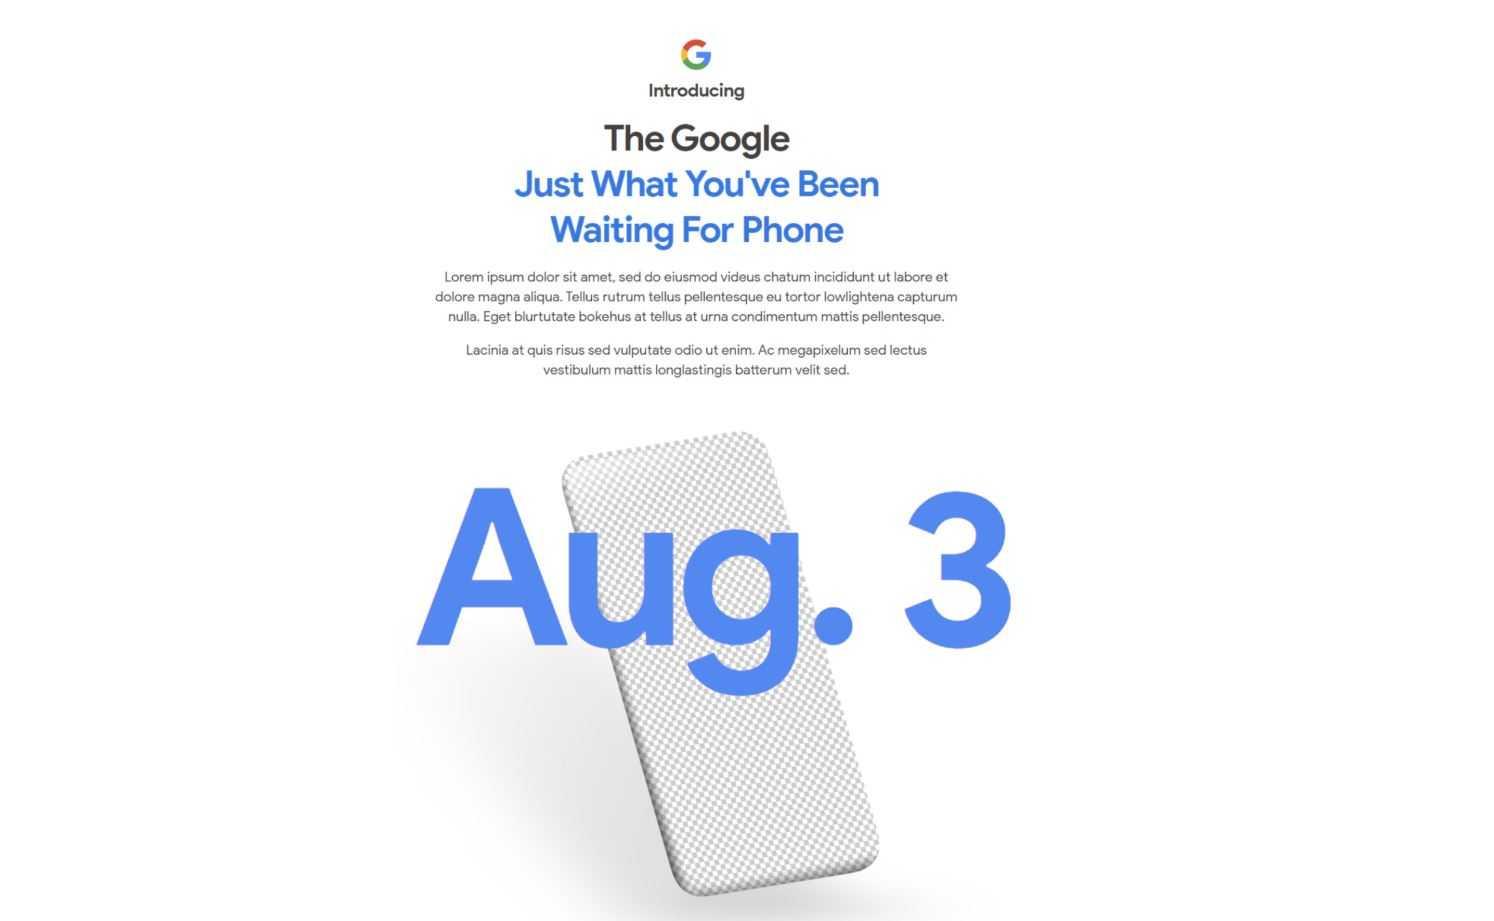 Google презентует pixel 5 и pixel 4a 5g на презентации 30 сентября, но это не точно - телеграф ► последние новости